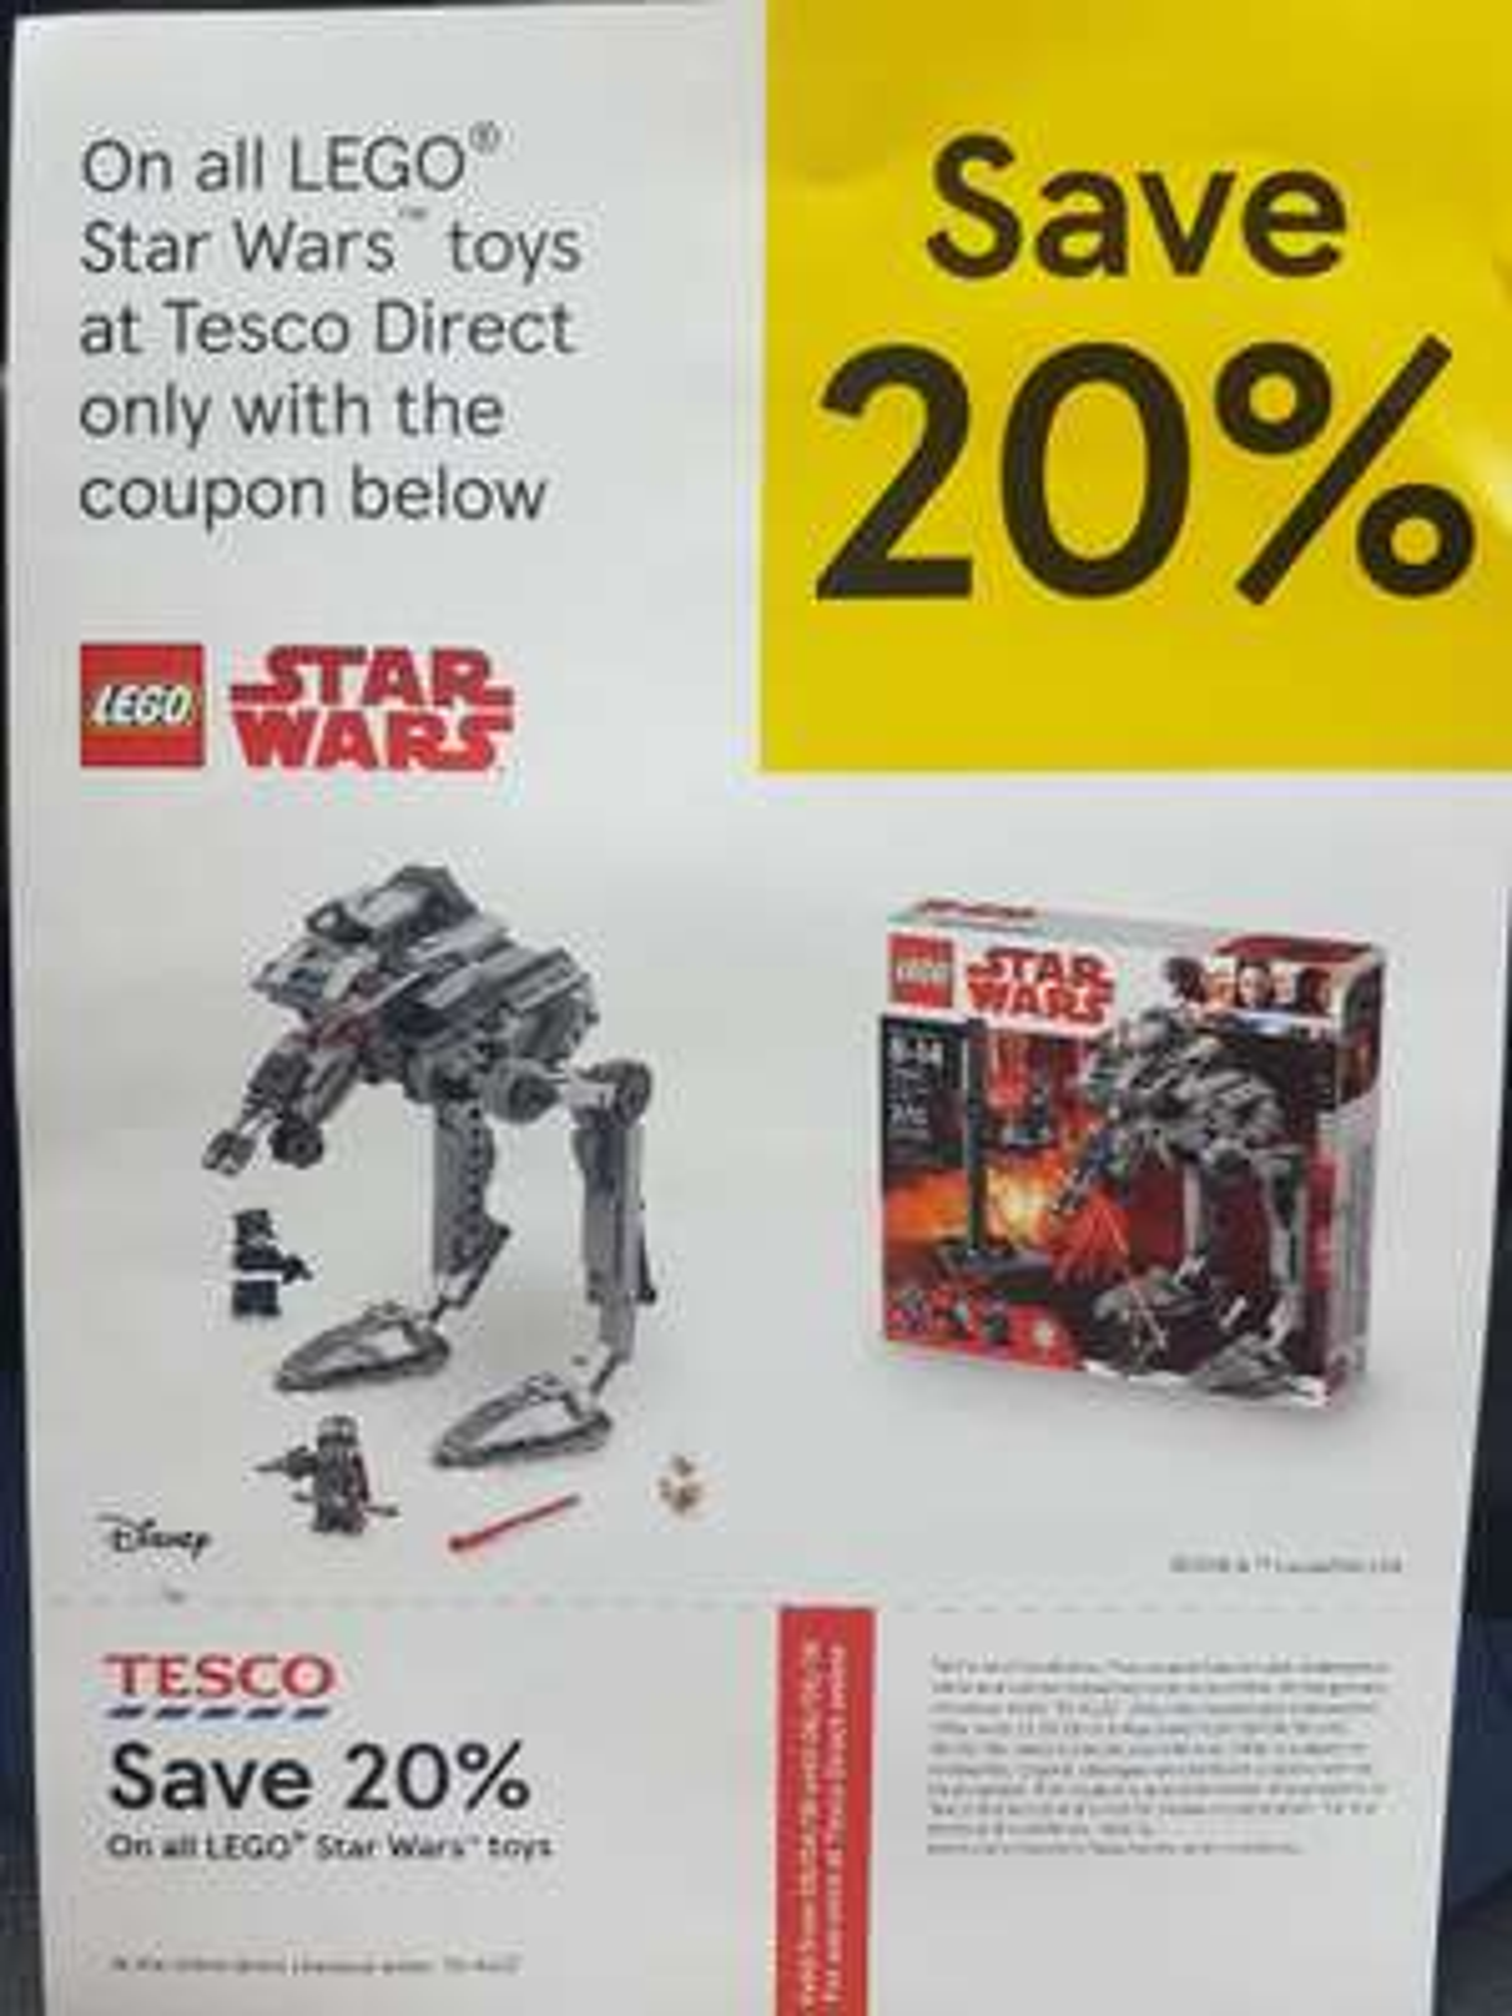 20% off Lego Star Wars (e.g.75190 Star Destroyer £103.20 / 75187 BB8 £60)  at Tesco Direct